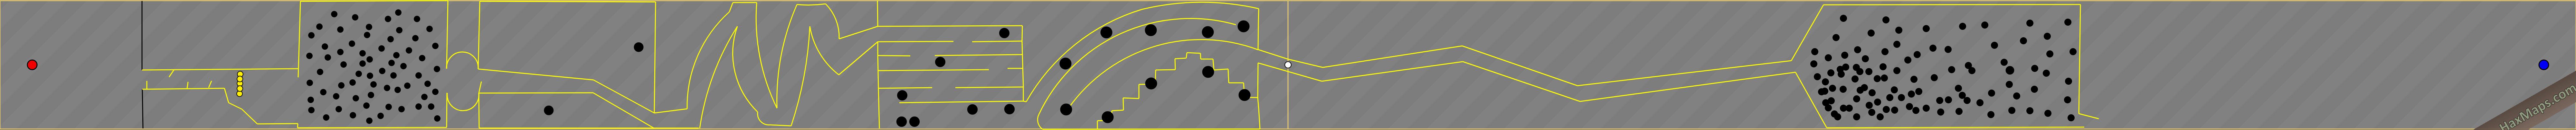 hax ball maps | The World's Hardest Yellow 2 by MasterMatkap`S